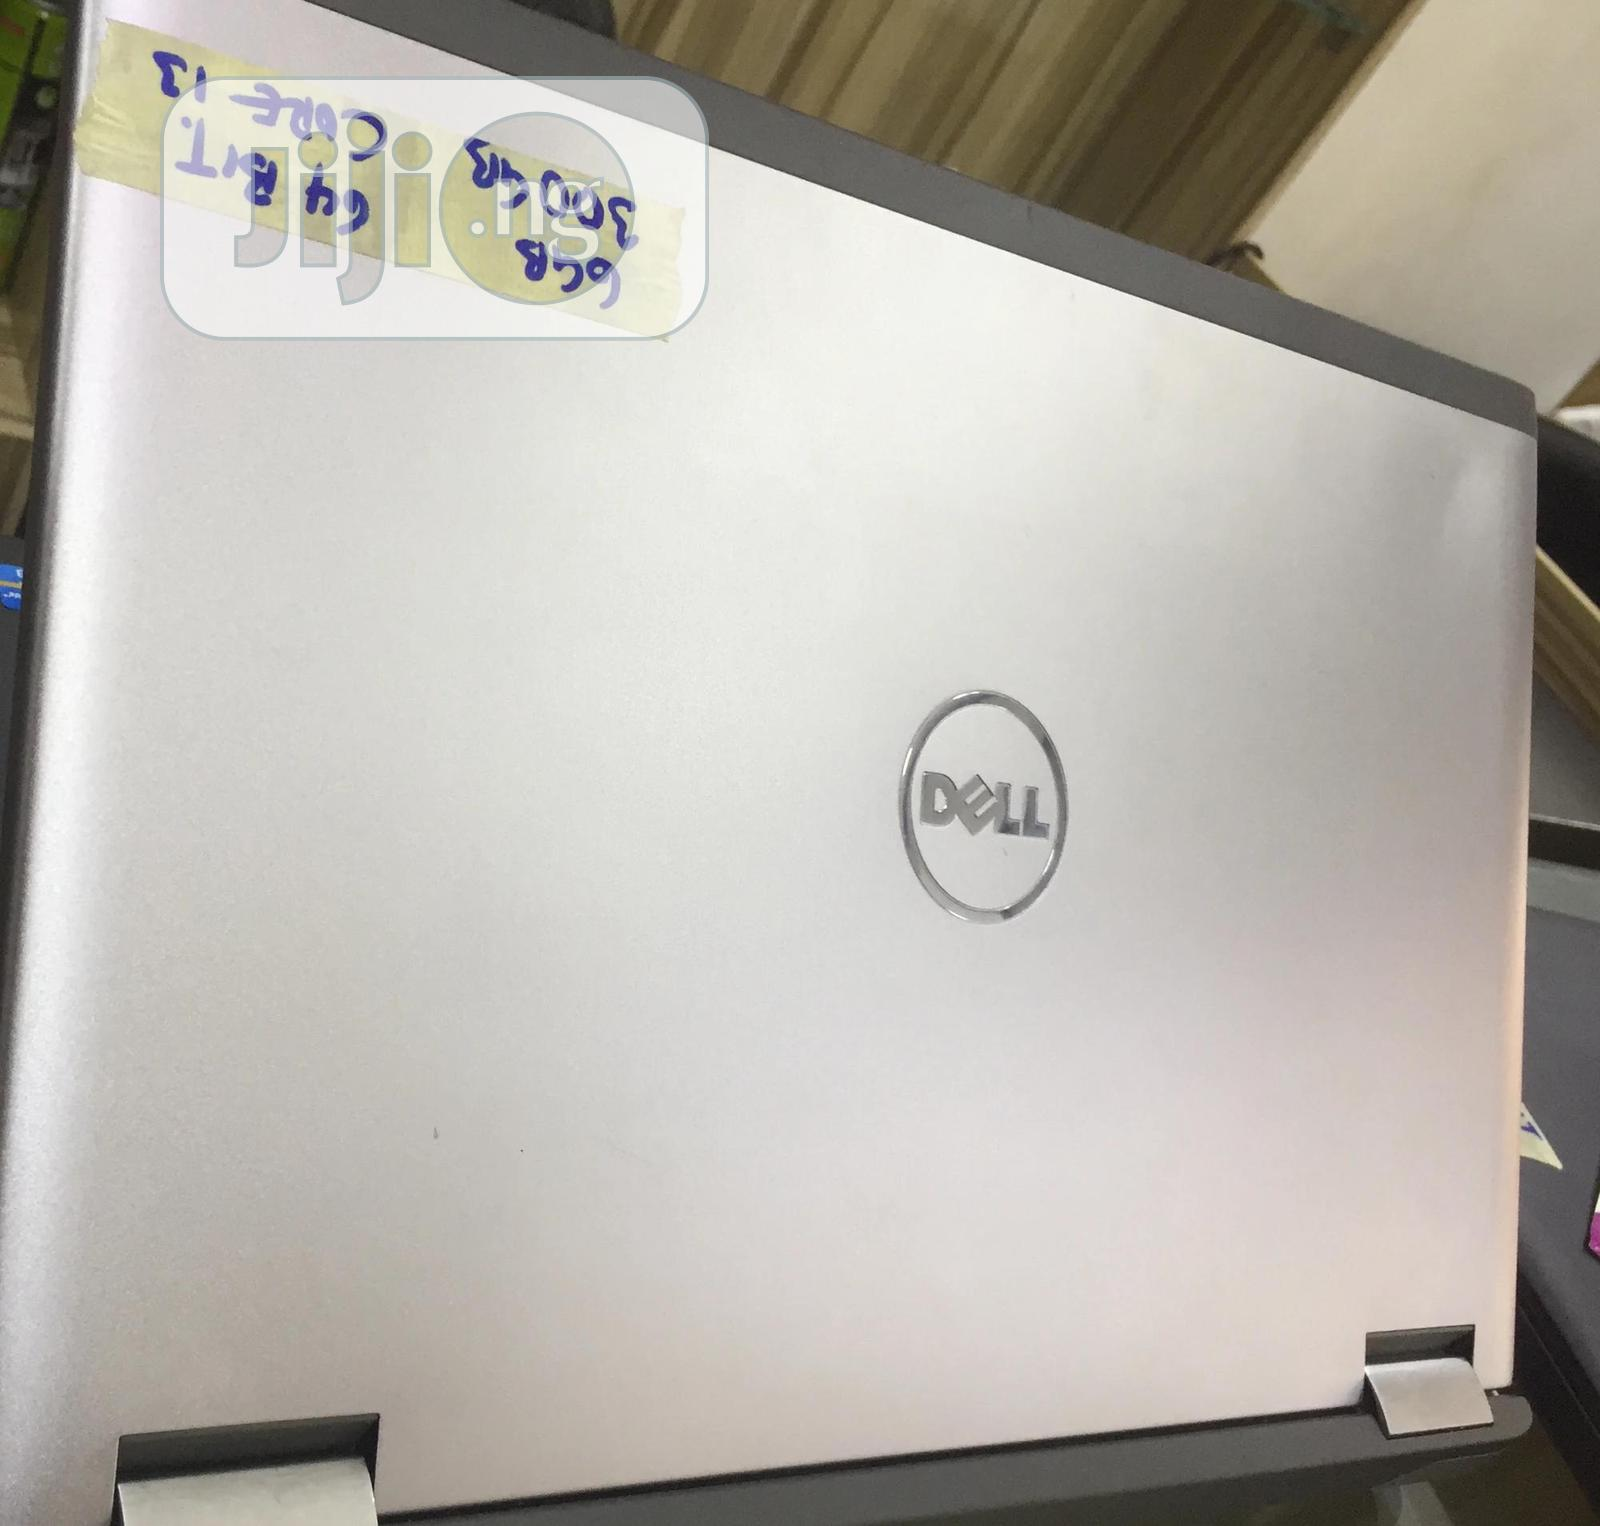 Laptop Dell Vostro 3560 6GB Intel Core i3 320GB | Laptops & Computers for sale in Wuse 2, Abuja (FCT) State, Nigeria